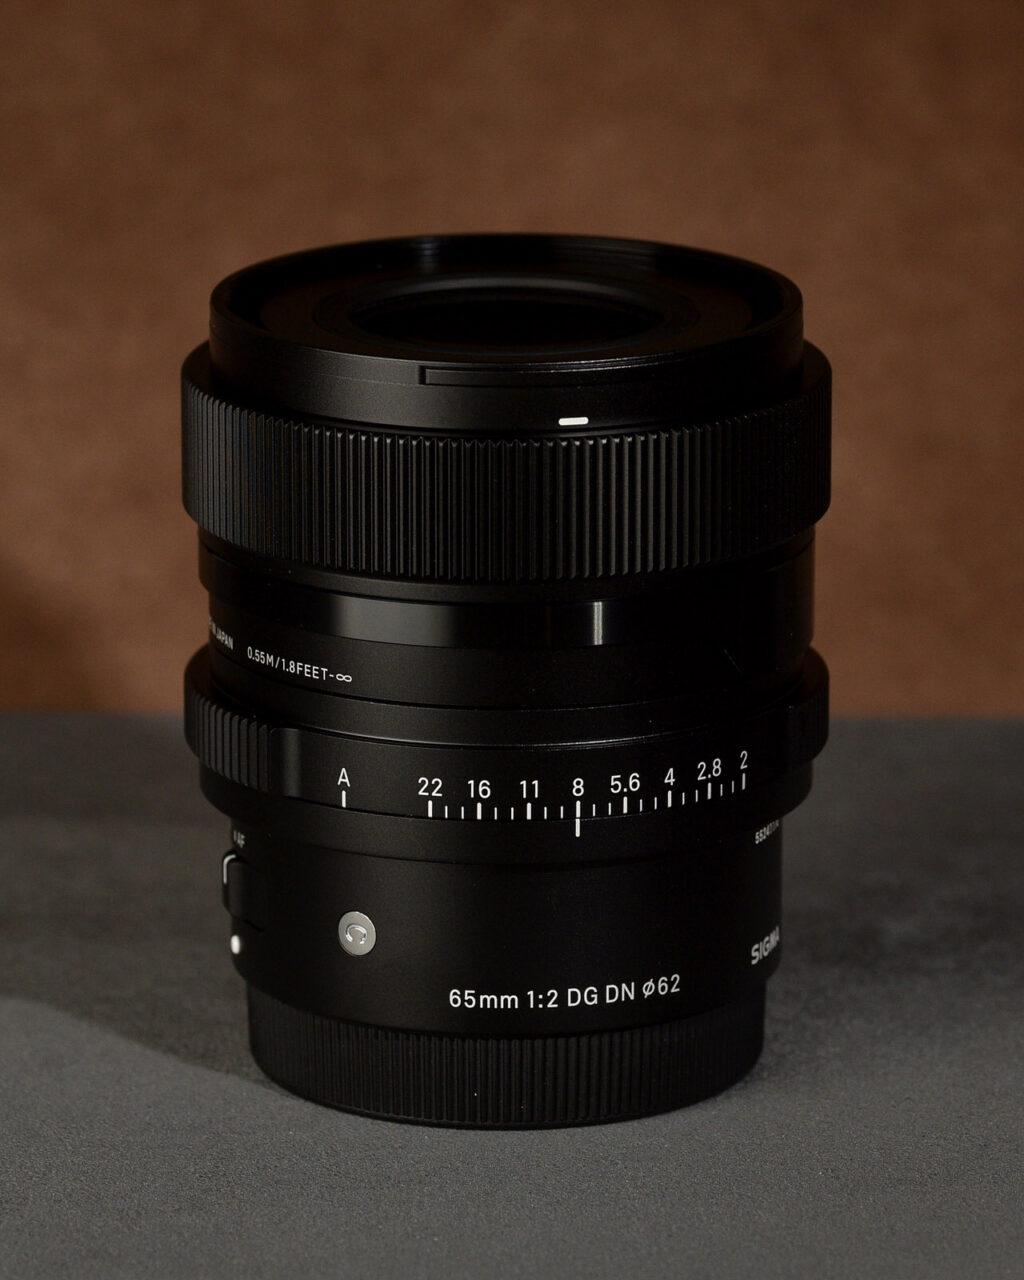 Sigma 35 i 65 mm f/2 DG DN C | DigitalFoto magazin